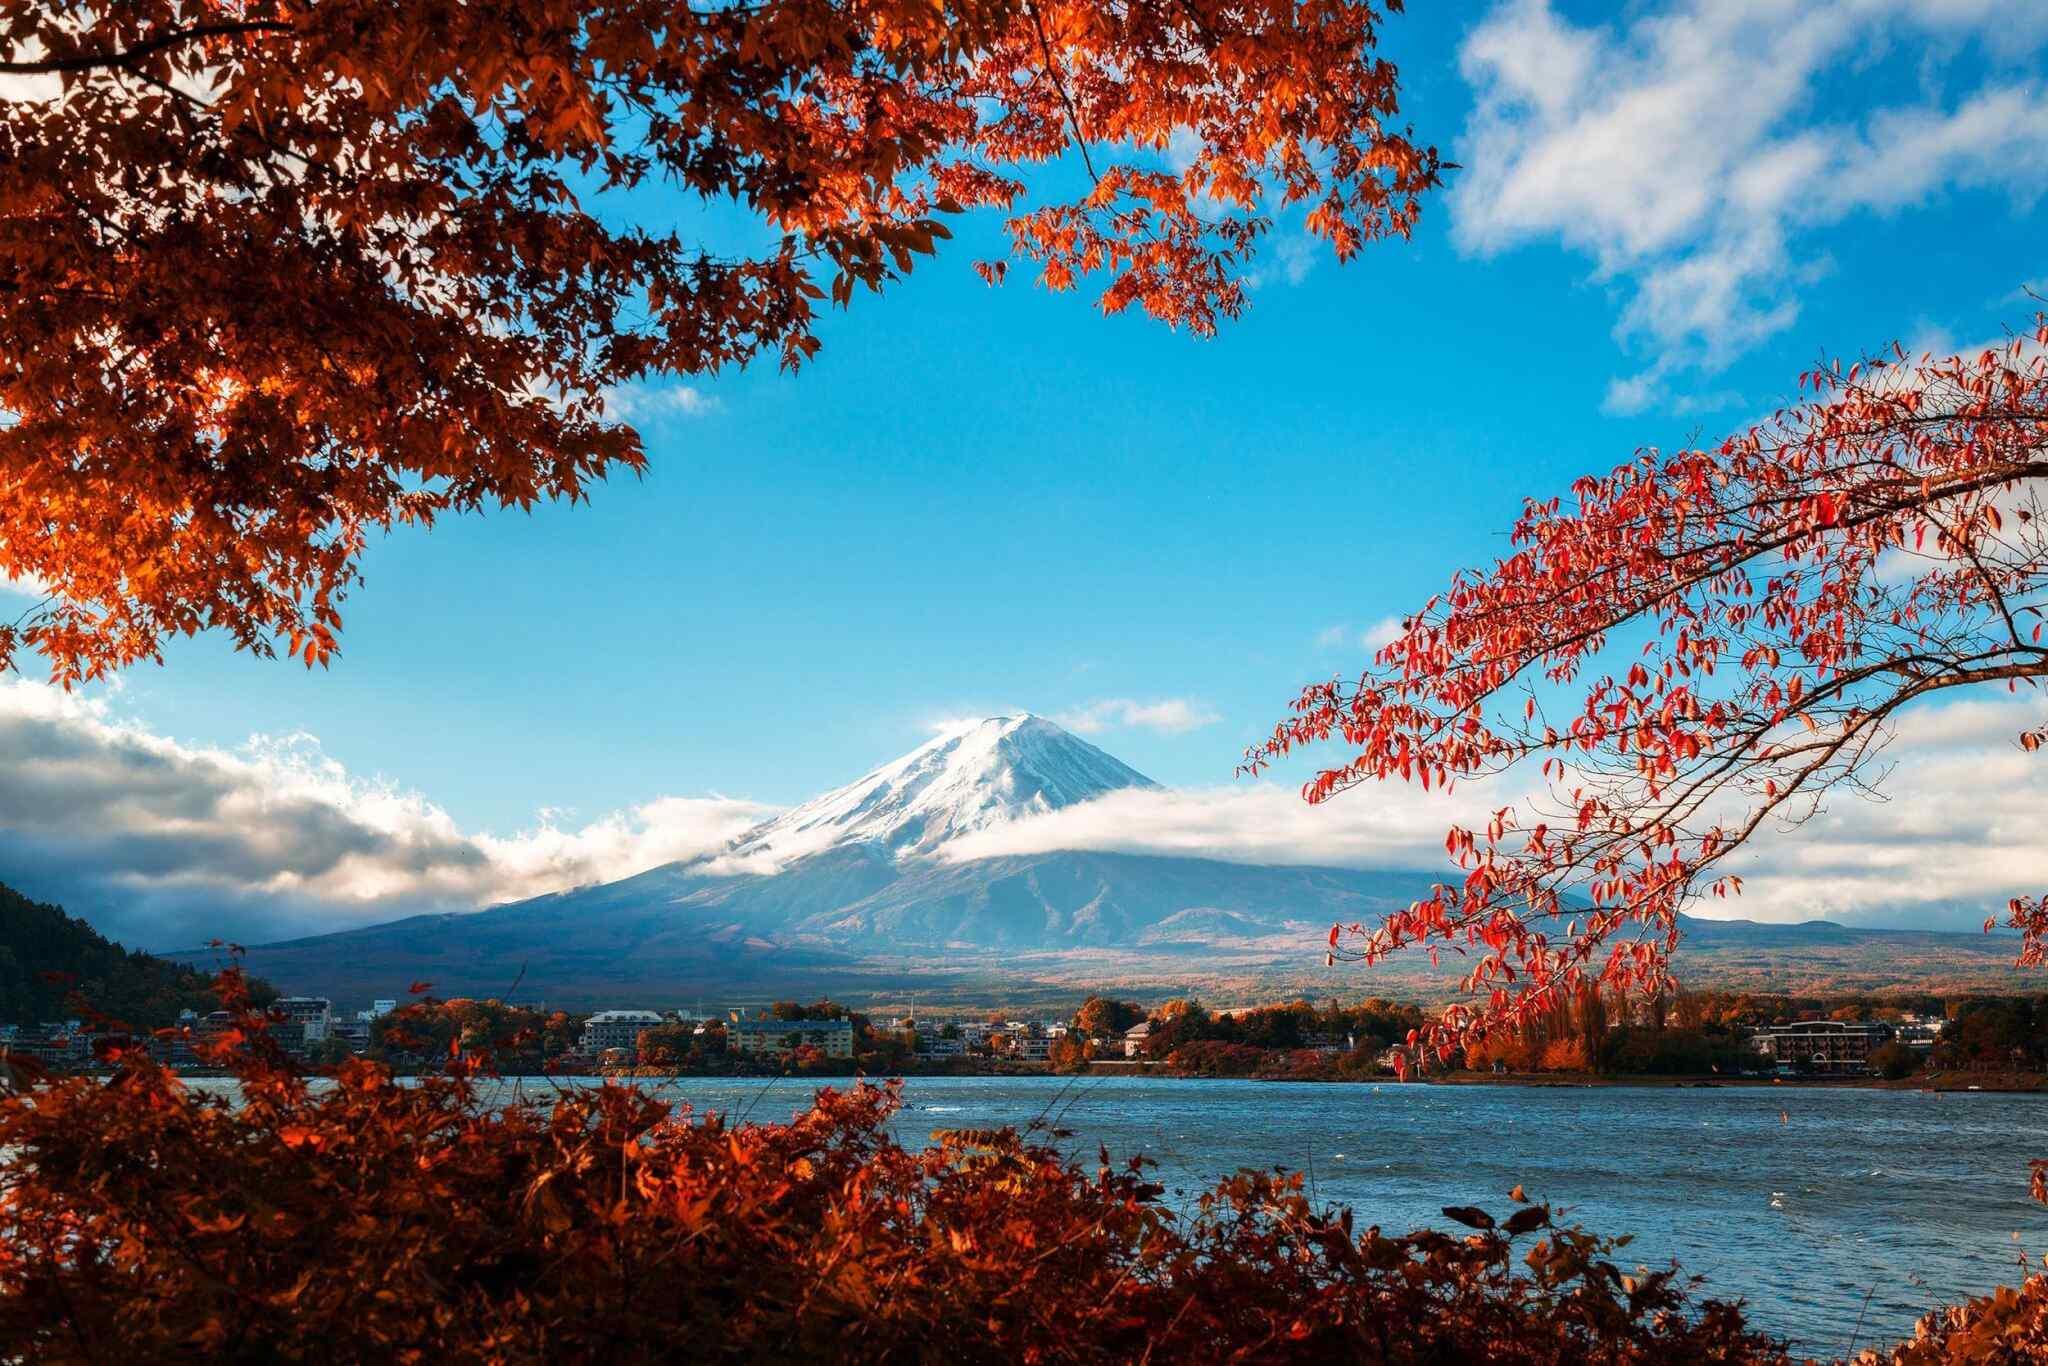 https://www.banitours.com/wp-content/uploads/2018/09/tour-fuji-04.jpg